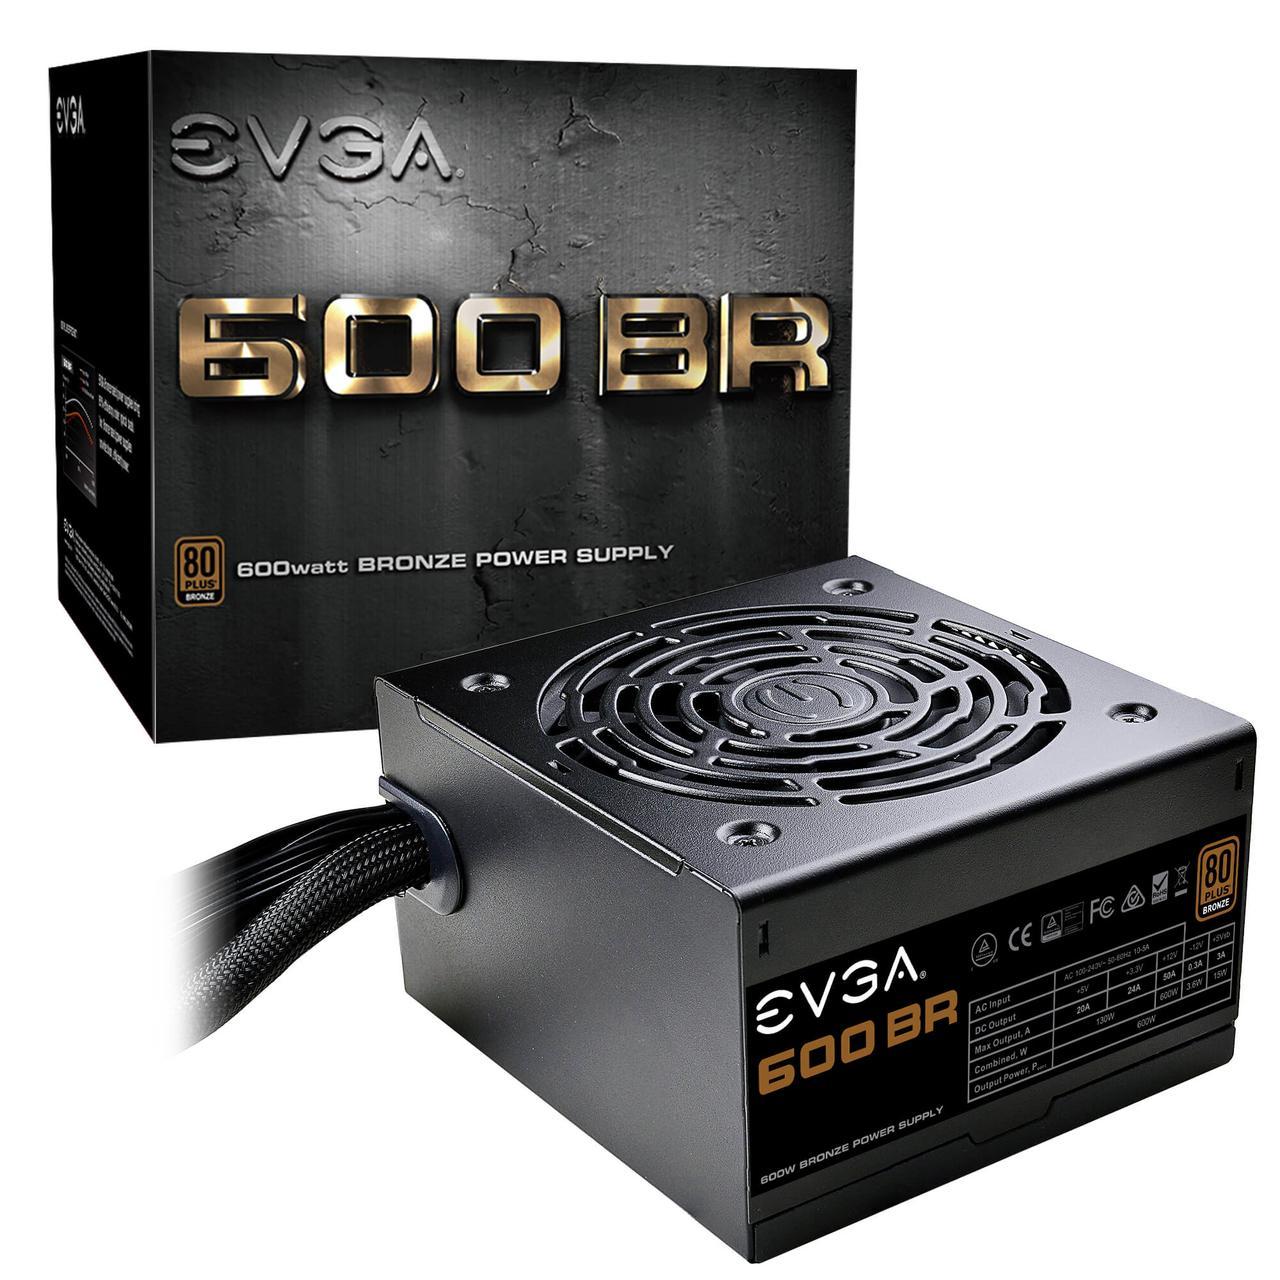 Блок питания ATX 600W EVGA 600 BR, Active PFC, вентилятор 12 см, 80+ BRONZE 100-BR-0600-K2